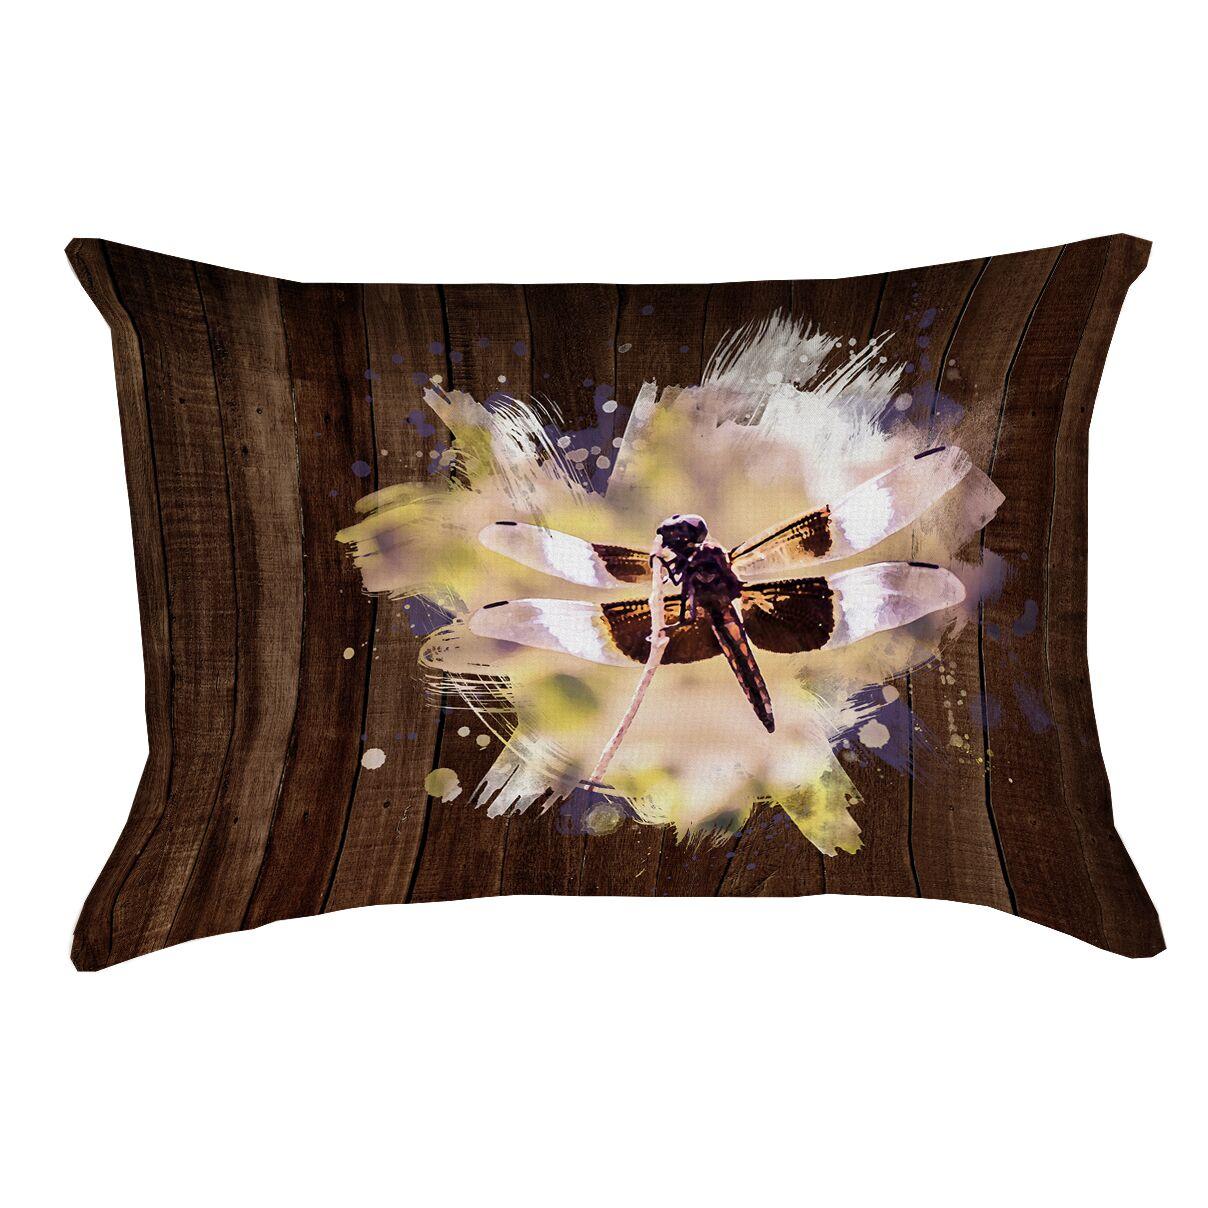 Hansard Watercolor Dragonfly Printed Pillow Cover